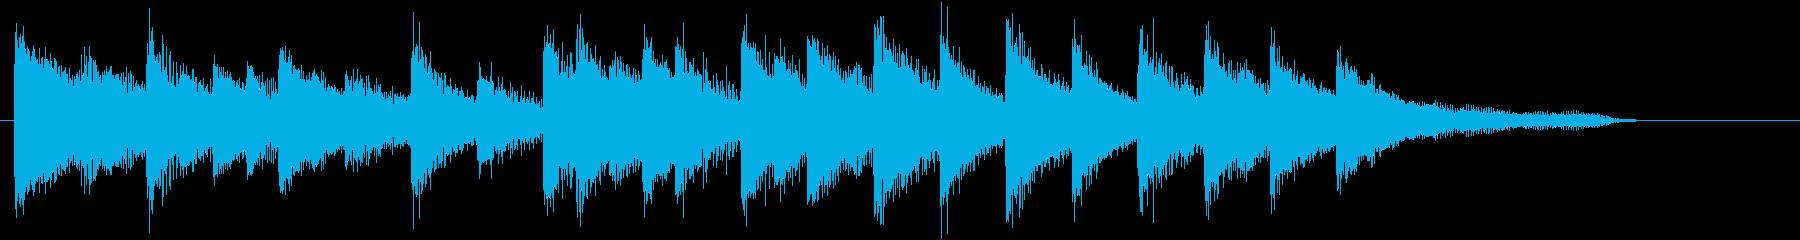 Xmasに♪世界に告げよピアノジングルAの再生済みの波形